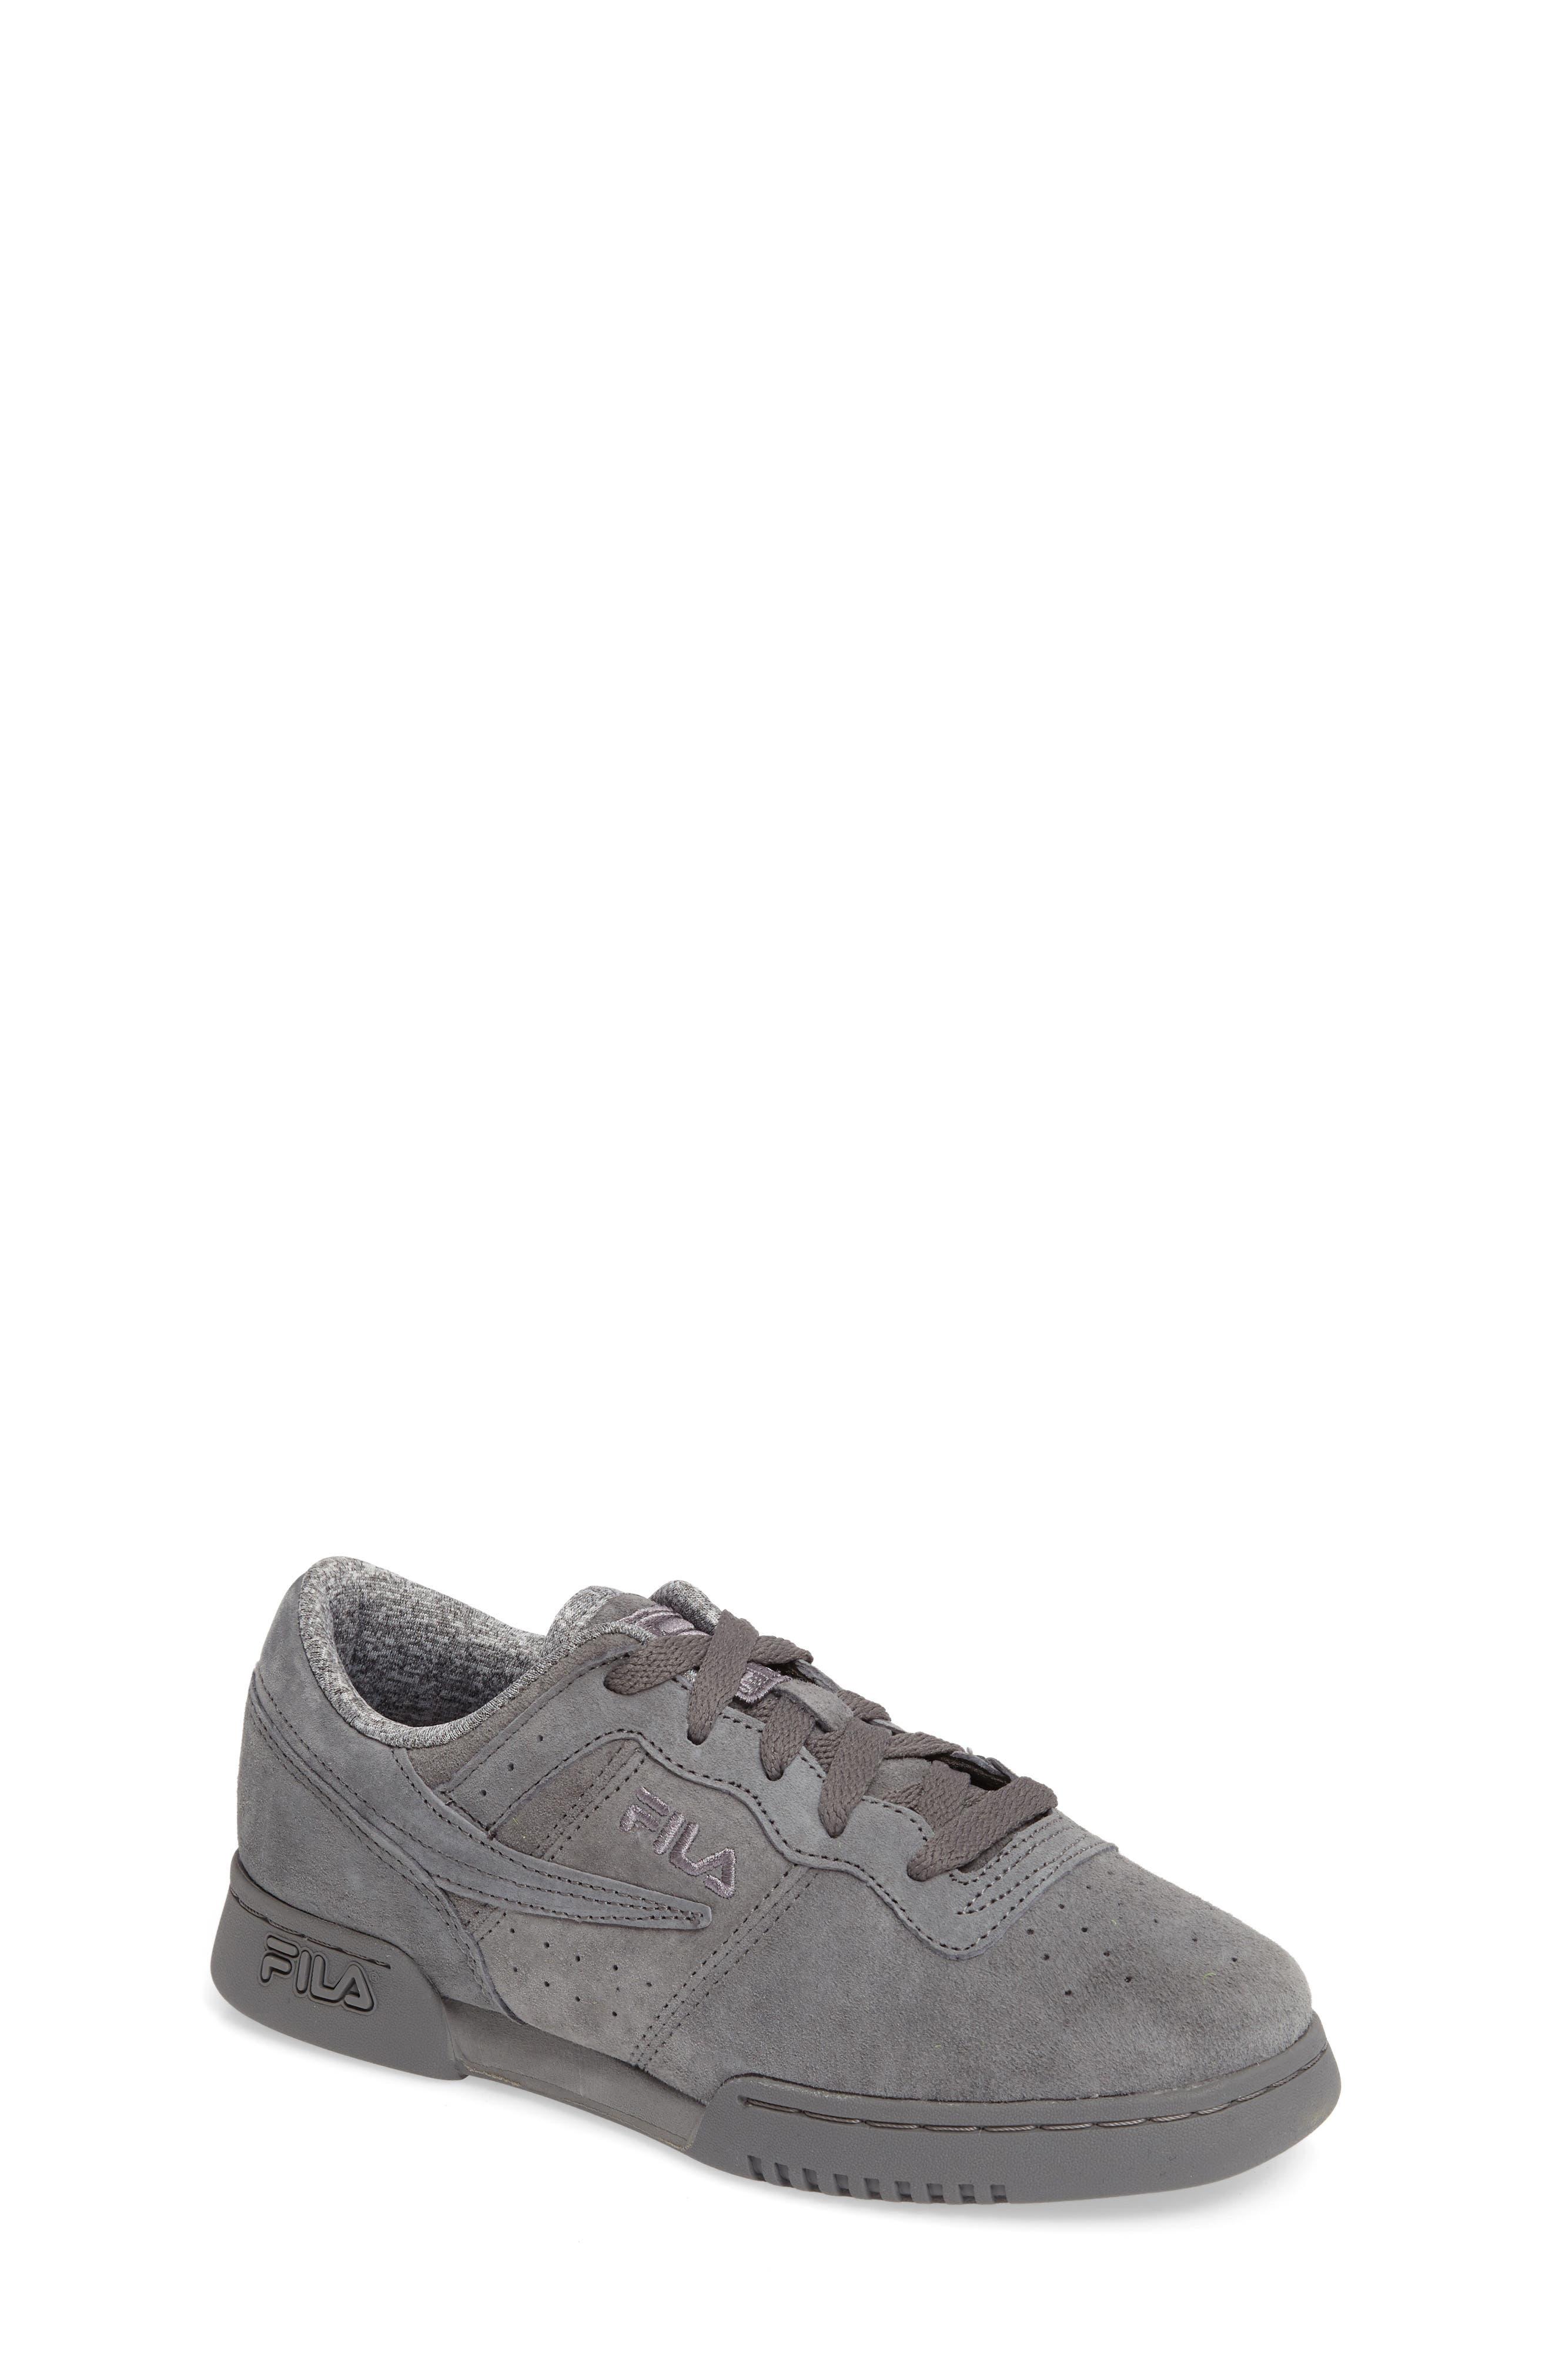 Heritage Sneaker,                         Main,                         color, 050